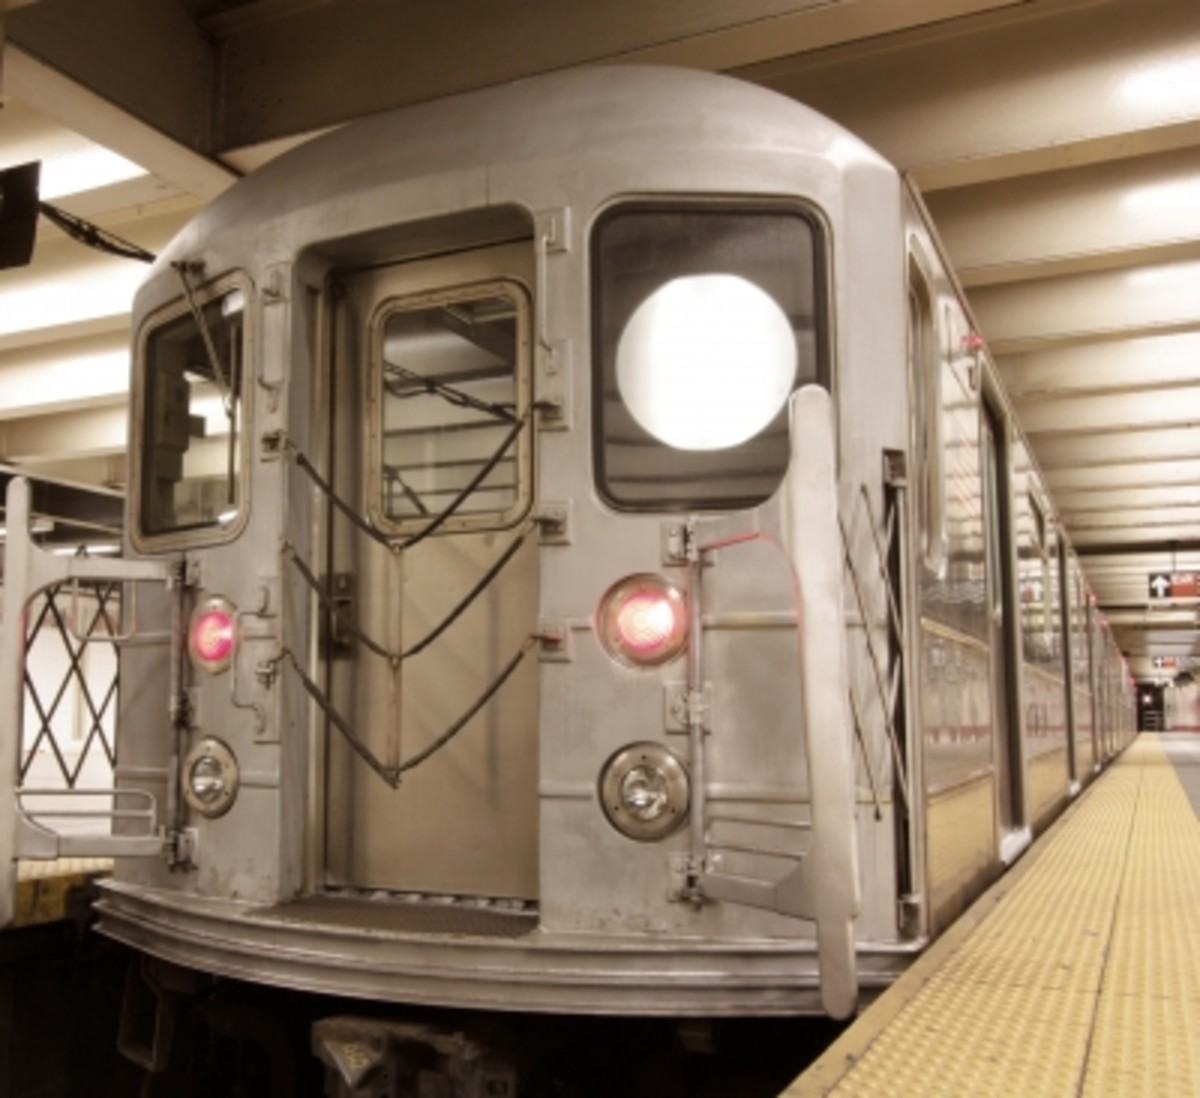 Public transportation options seem more alluring